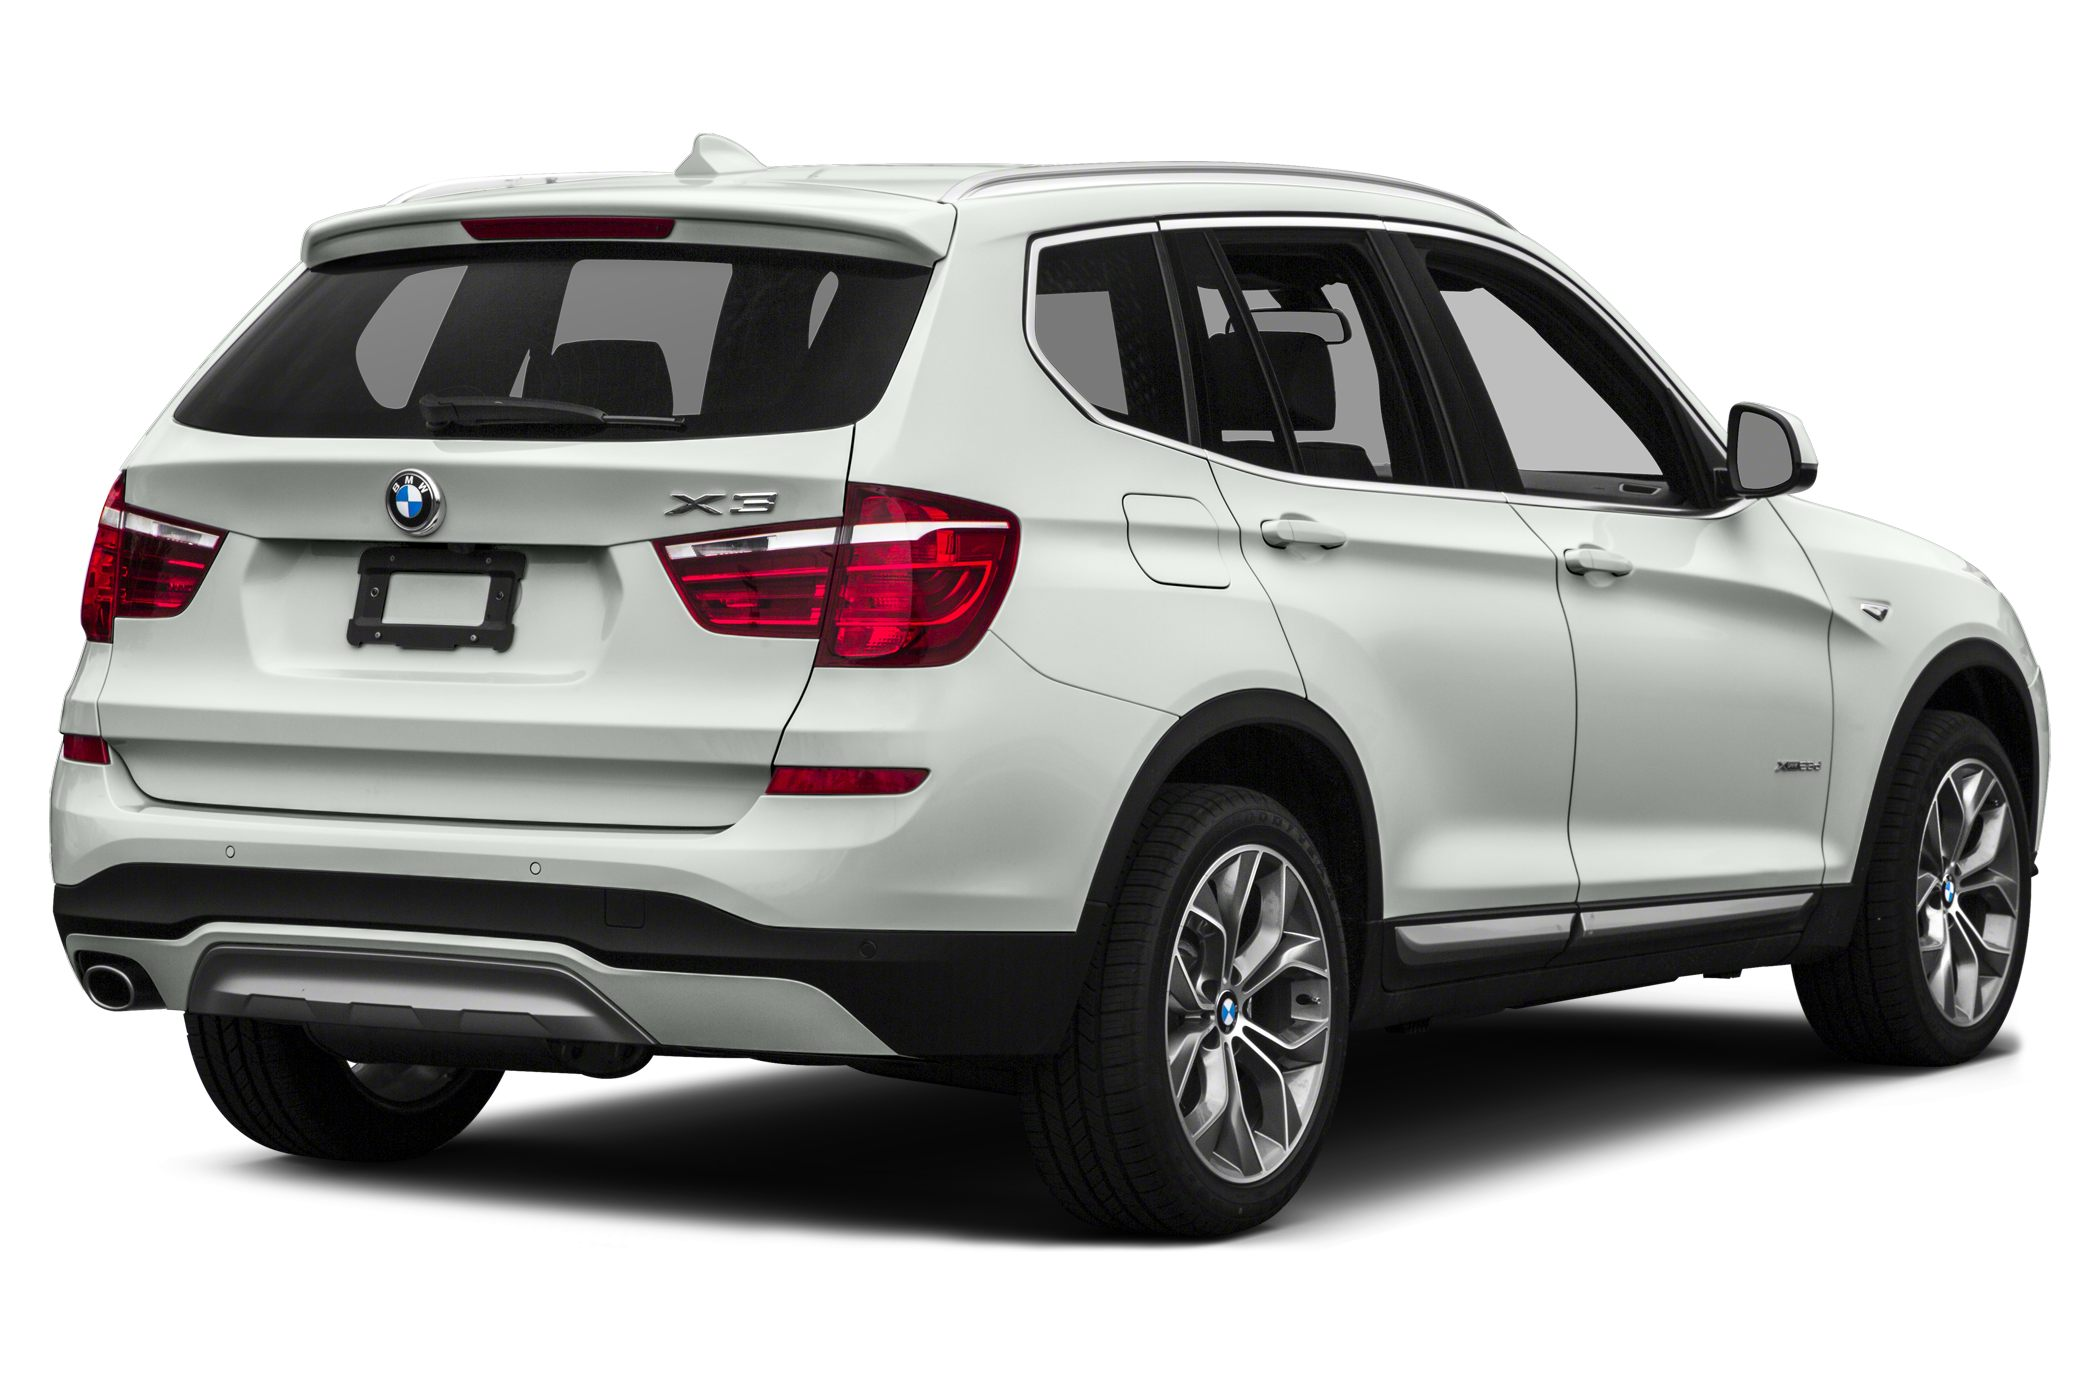 Bmw X3 Sport Utility Models Price Specs Reviews Cars Com